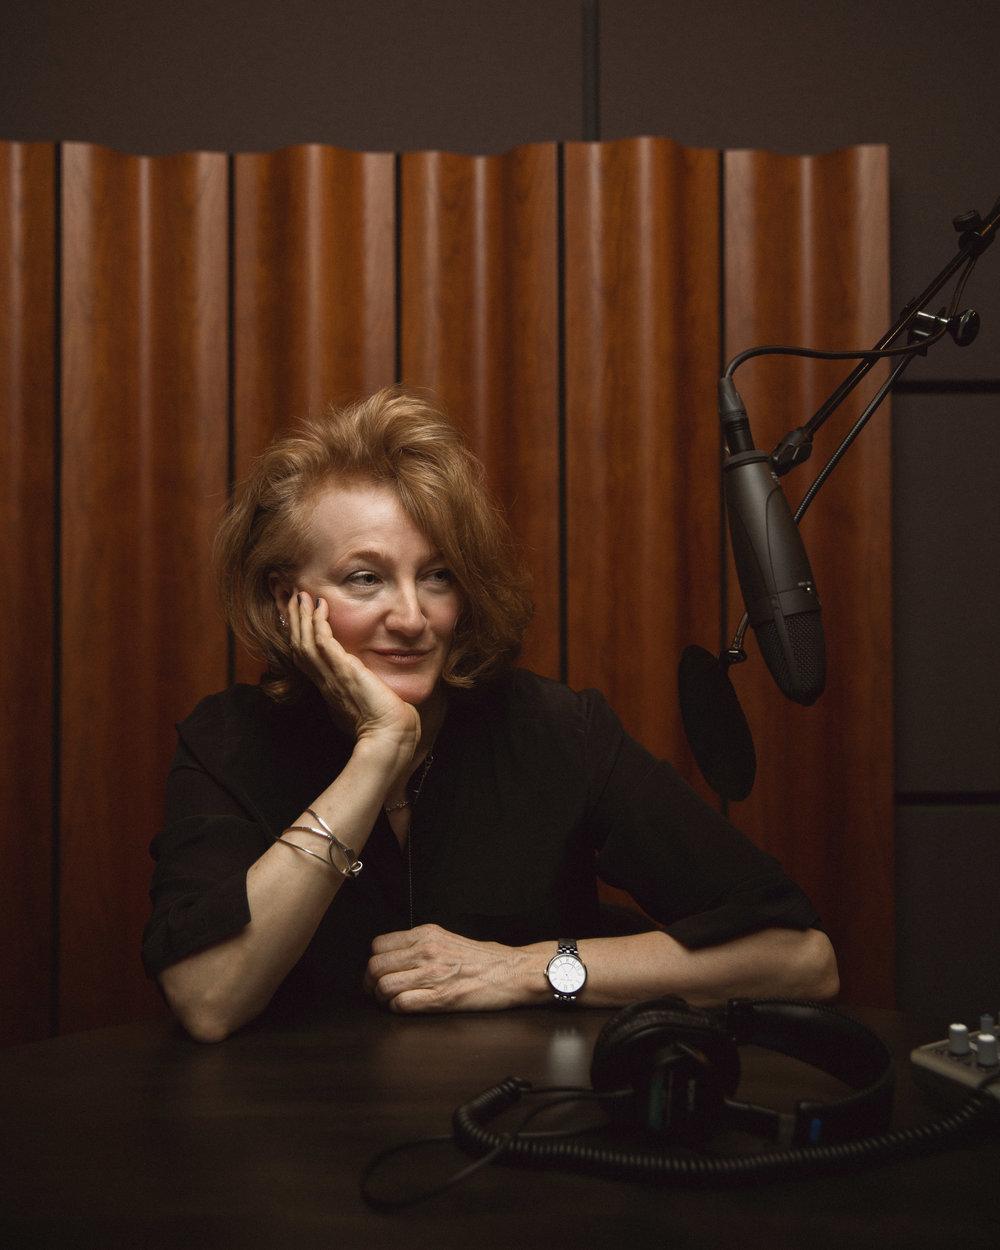 Krista Tippett | 56, Creature/Host of On Being, Author, Human Explorer